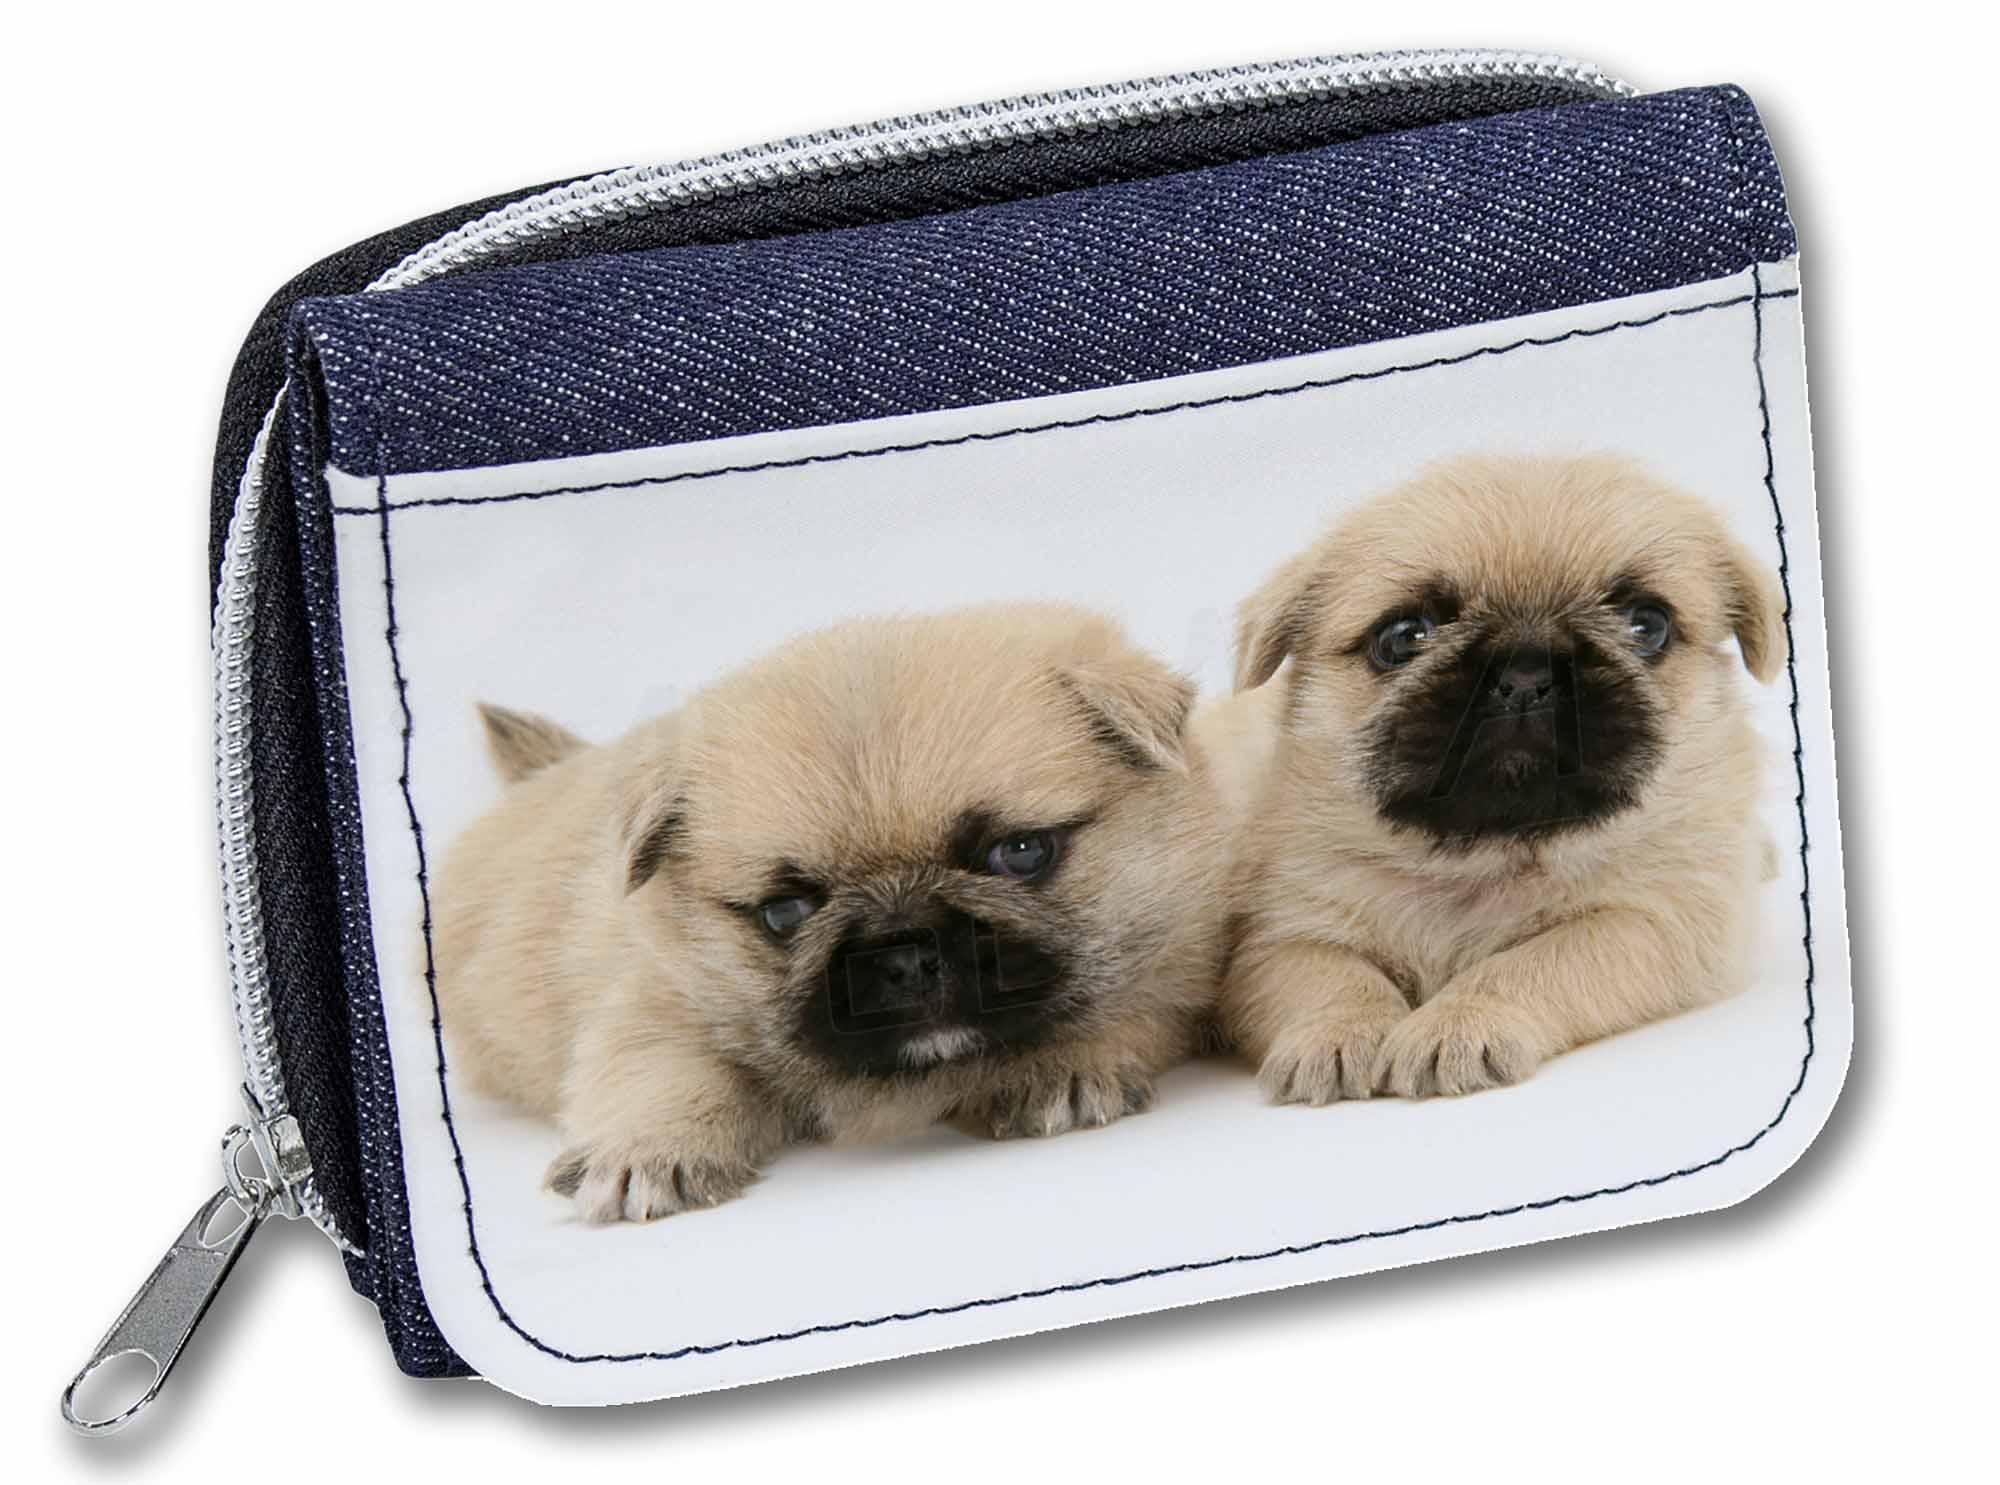 AD-P89JW Pugzu Dog Girls//Ladies Denim Purse Wallet Christmas Gift Idea